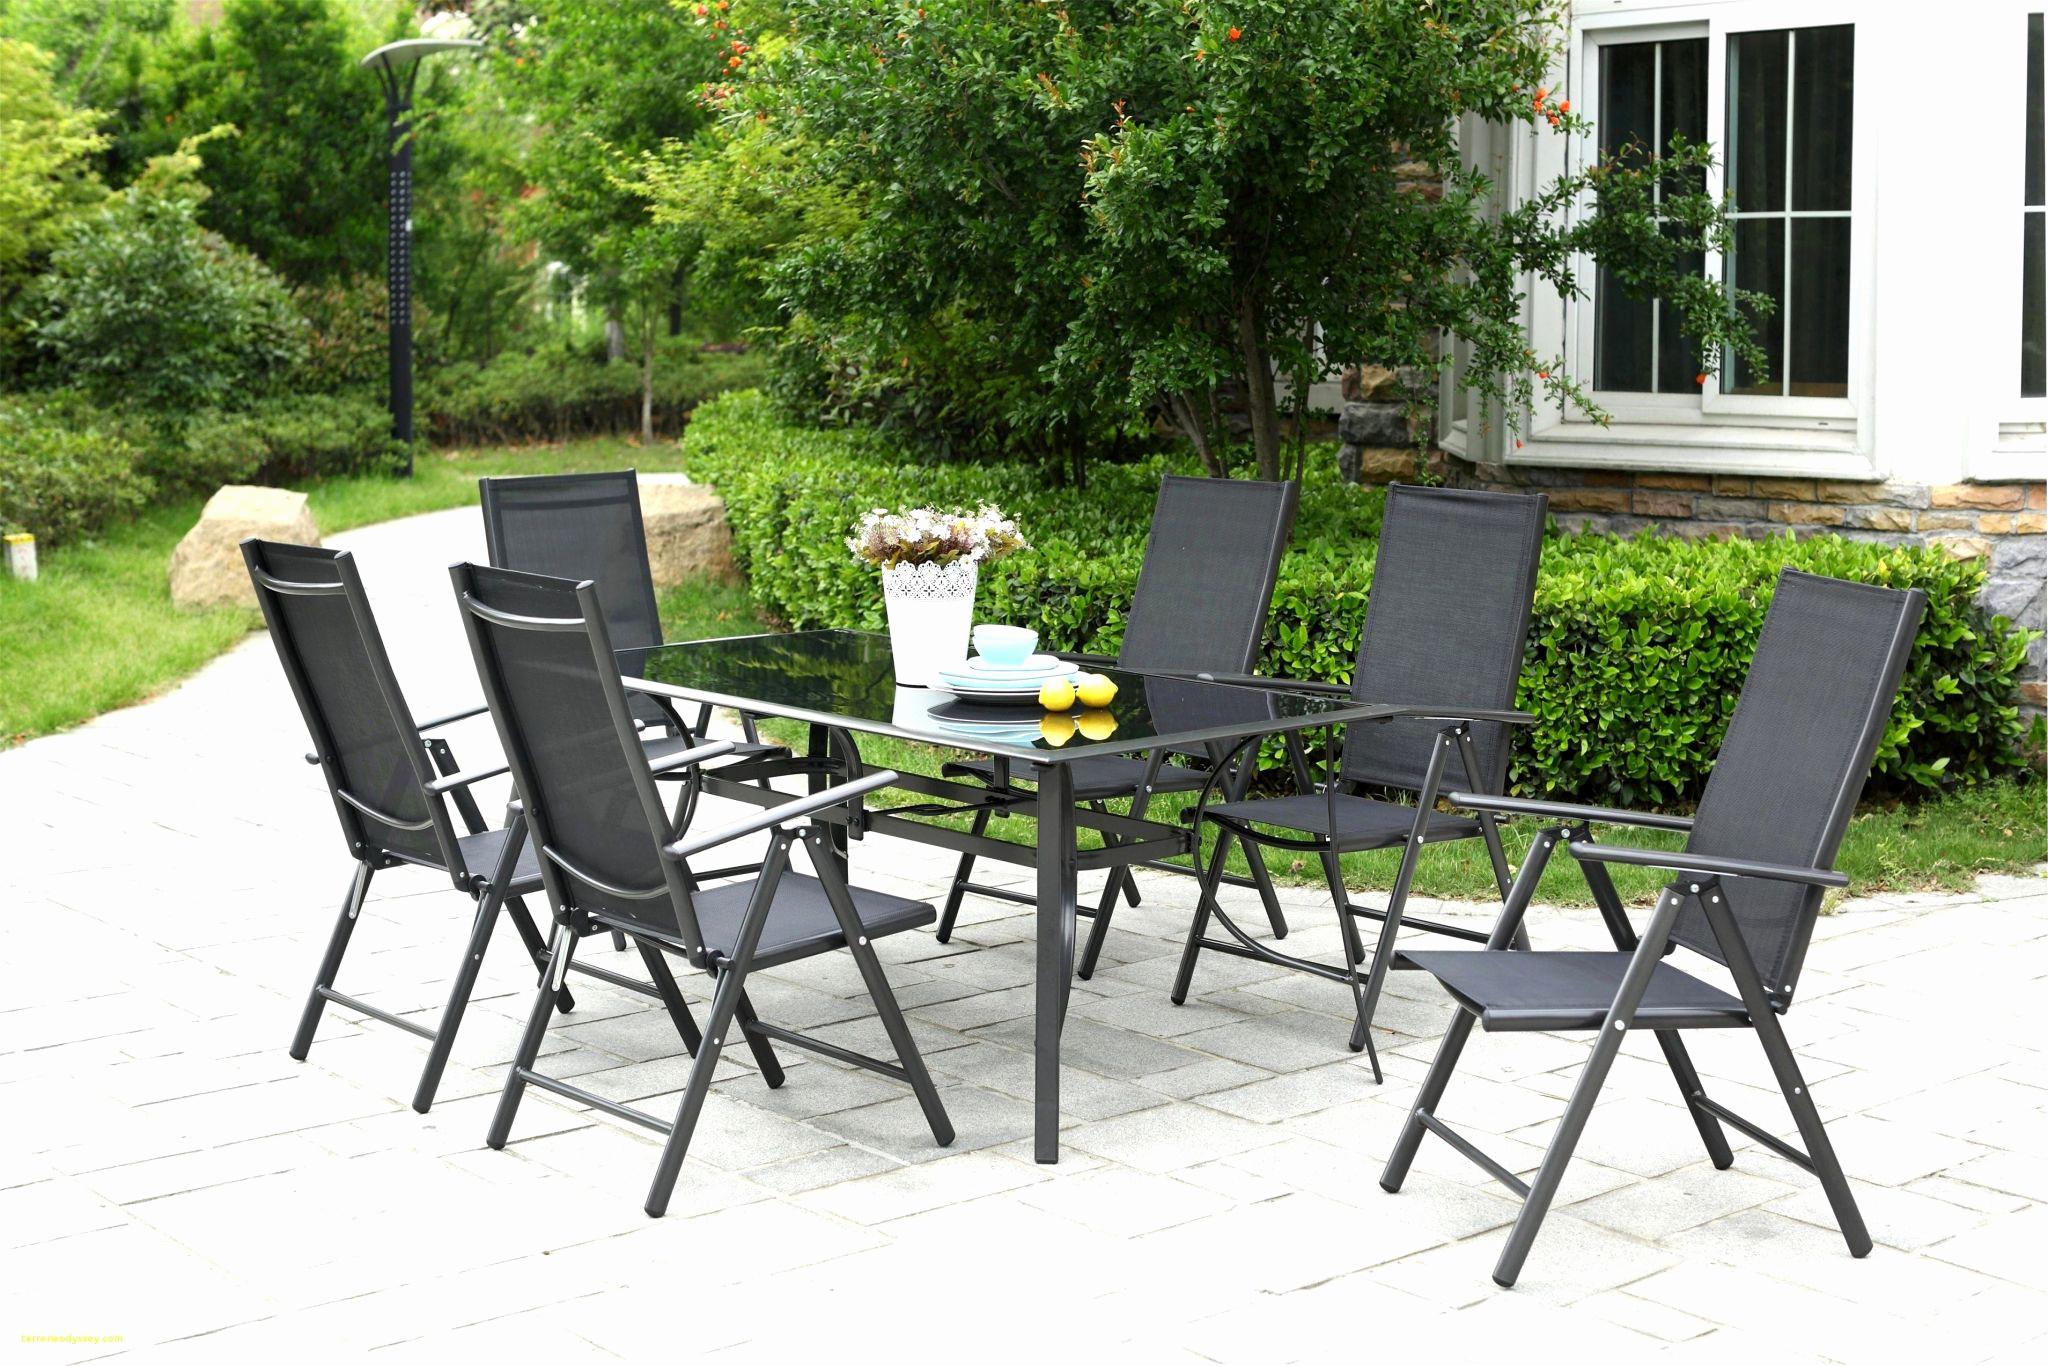 mobilier jardin allemand luxe salon jardin rotin aussi salon rotin best conforama chaise chaises of mobilier jardin allemand